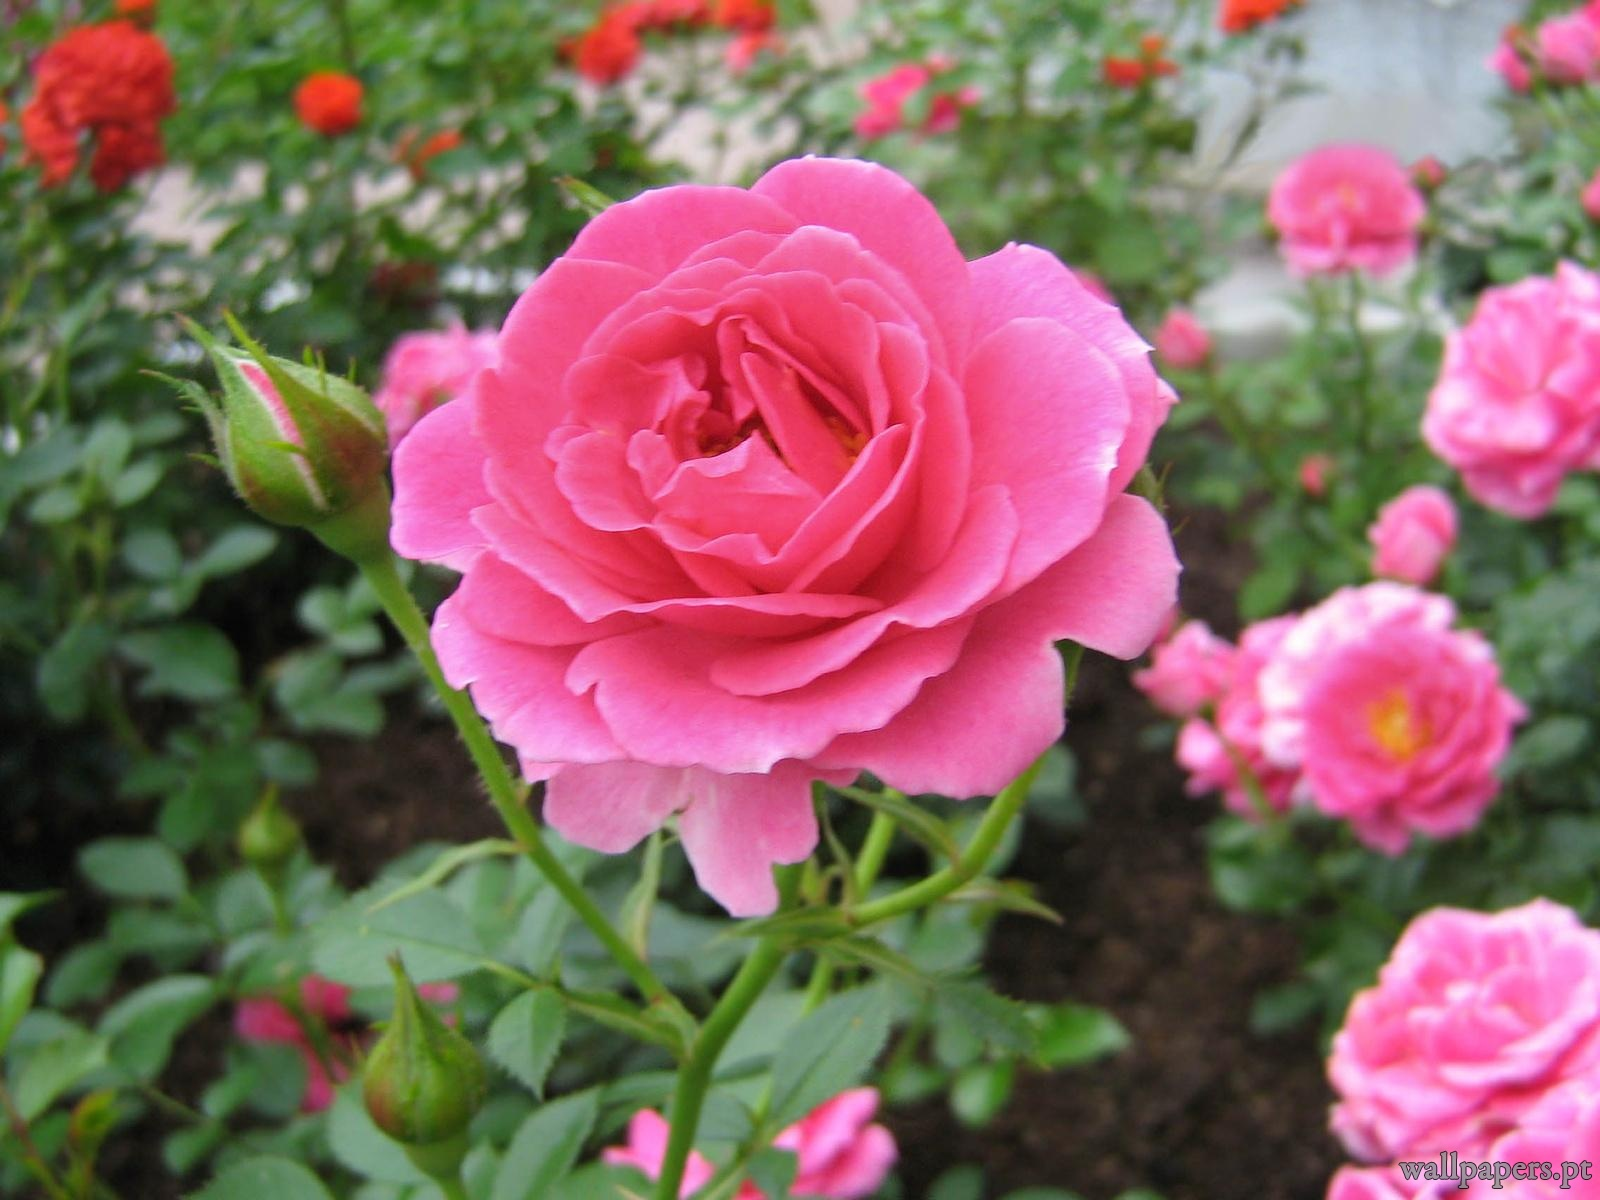 rosas no jardim de deus:sábado, 17 de novembro de 2012